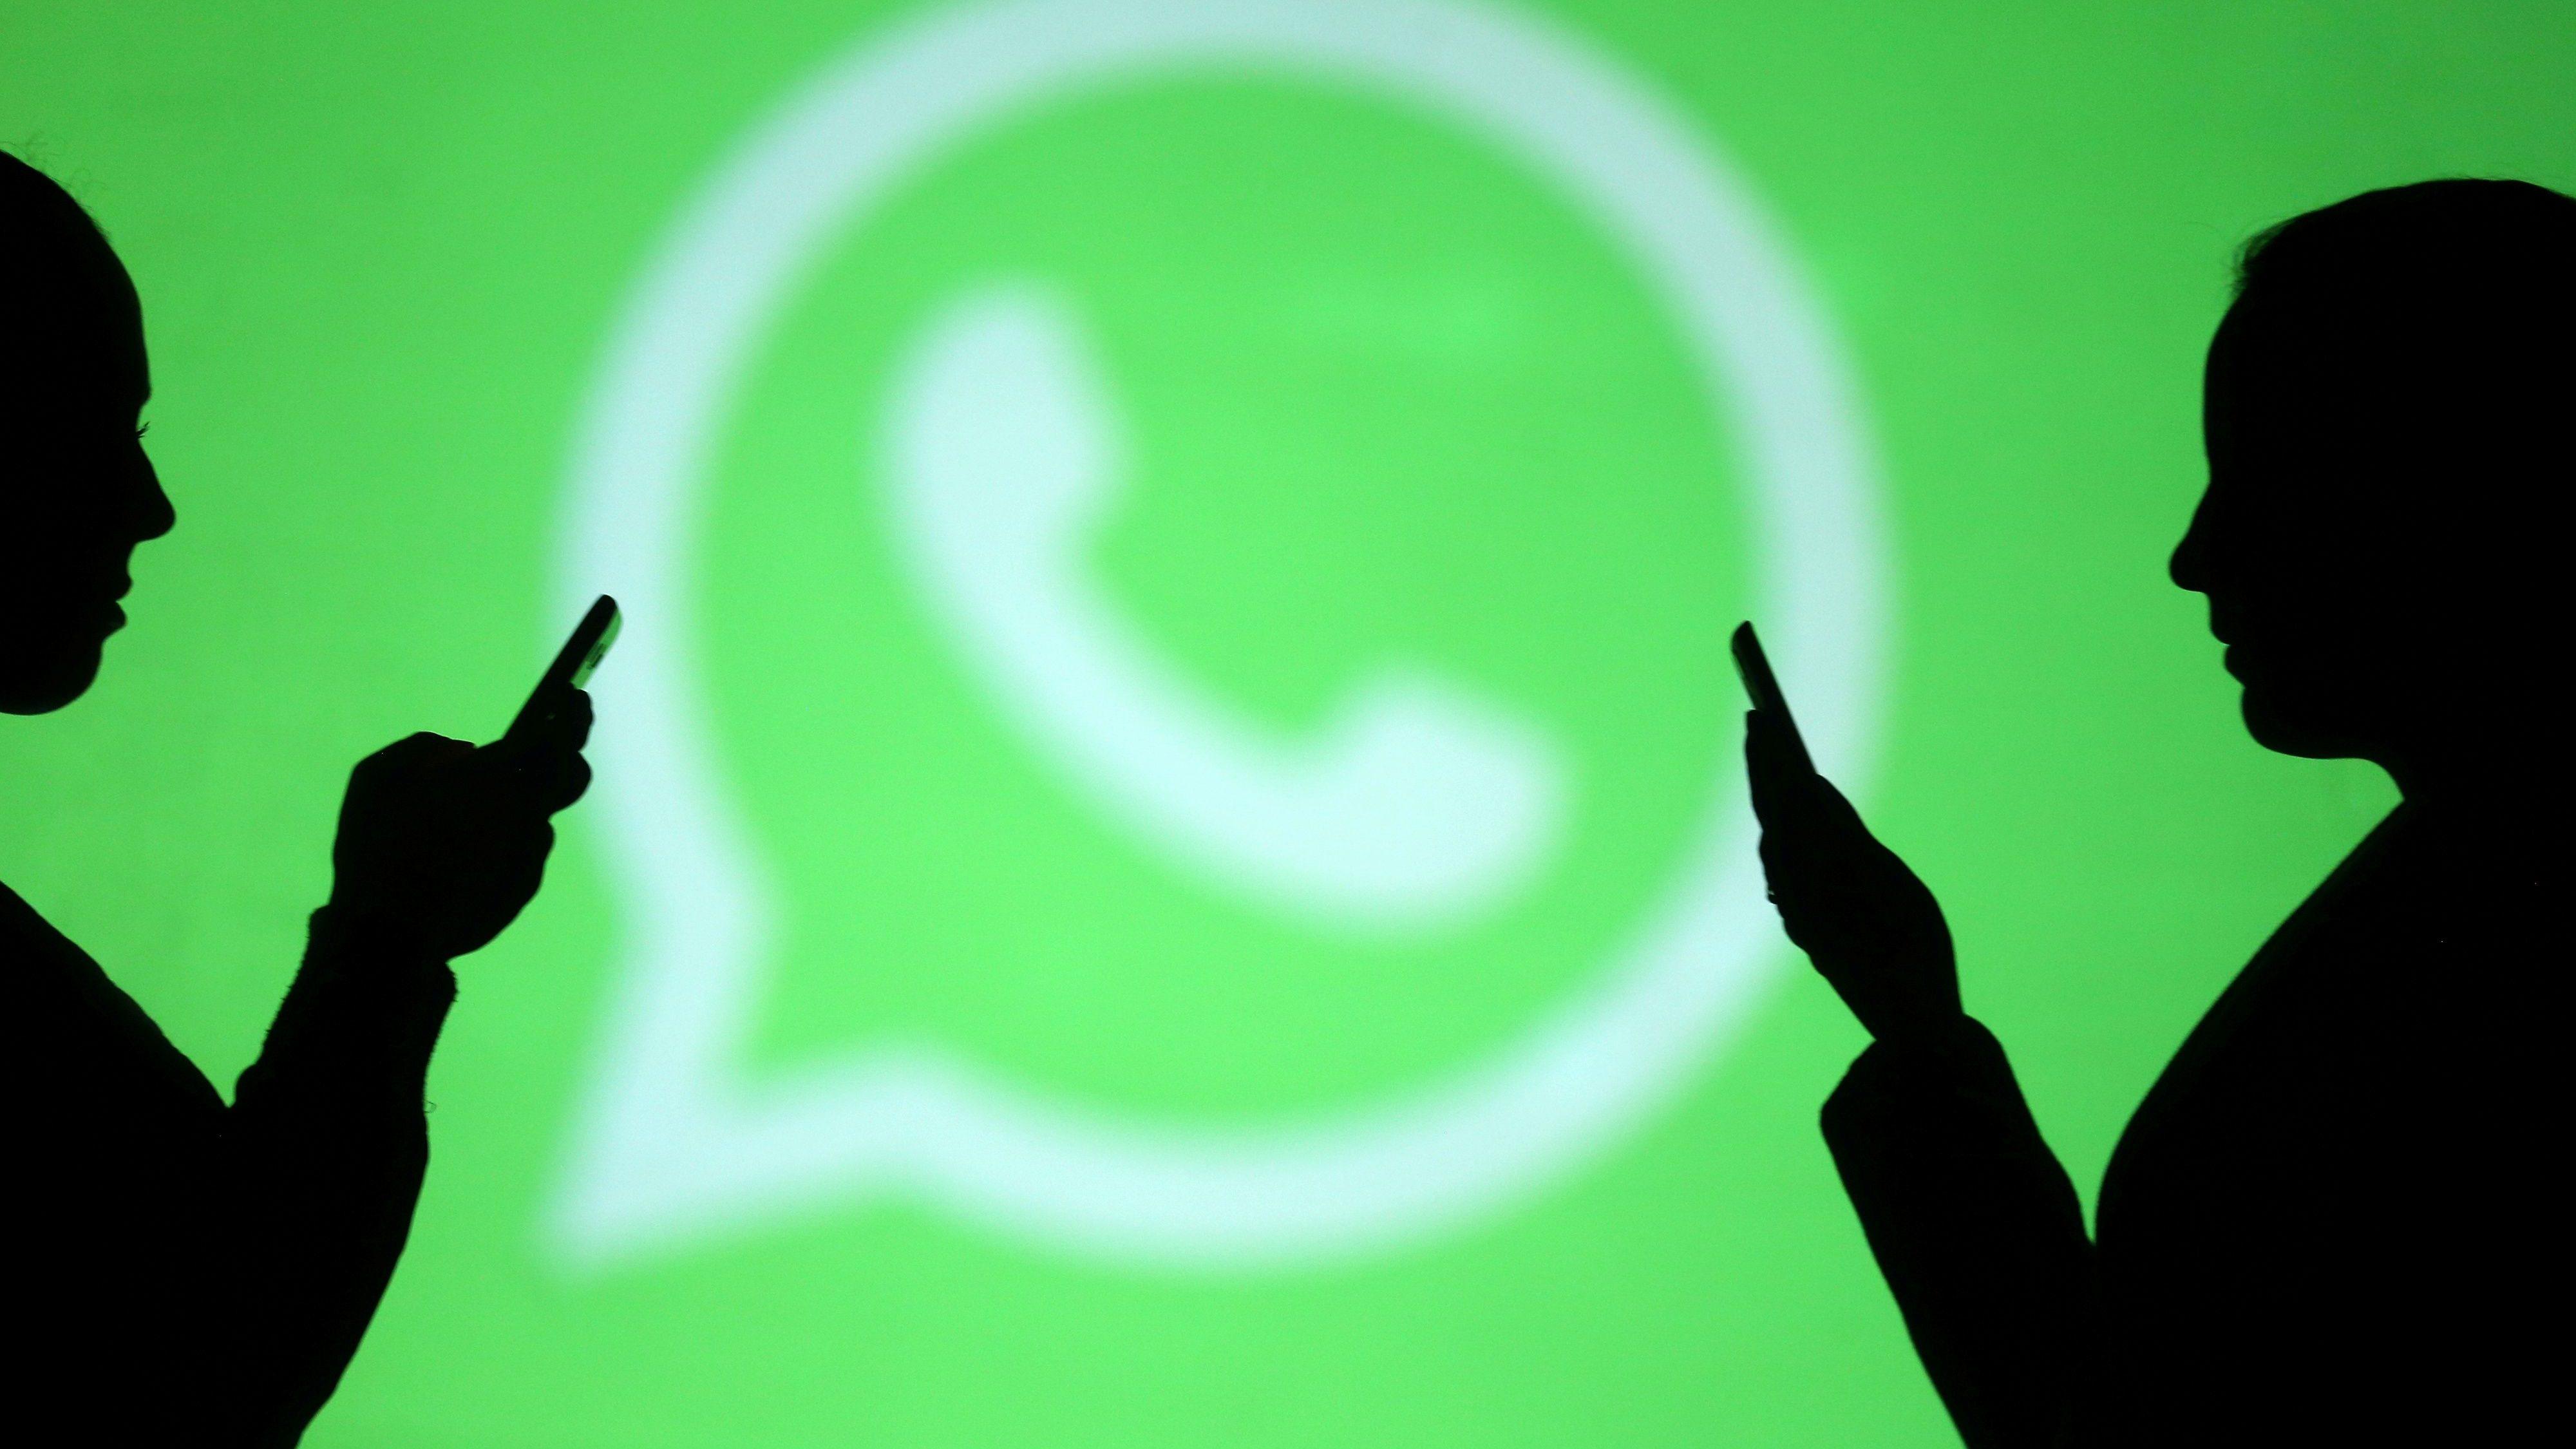 WhatsApp faces rival Moya Messenger in South Africa — Quartz